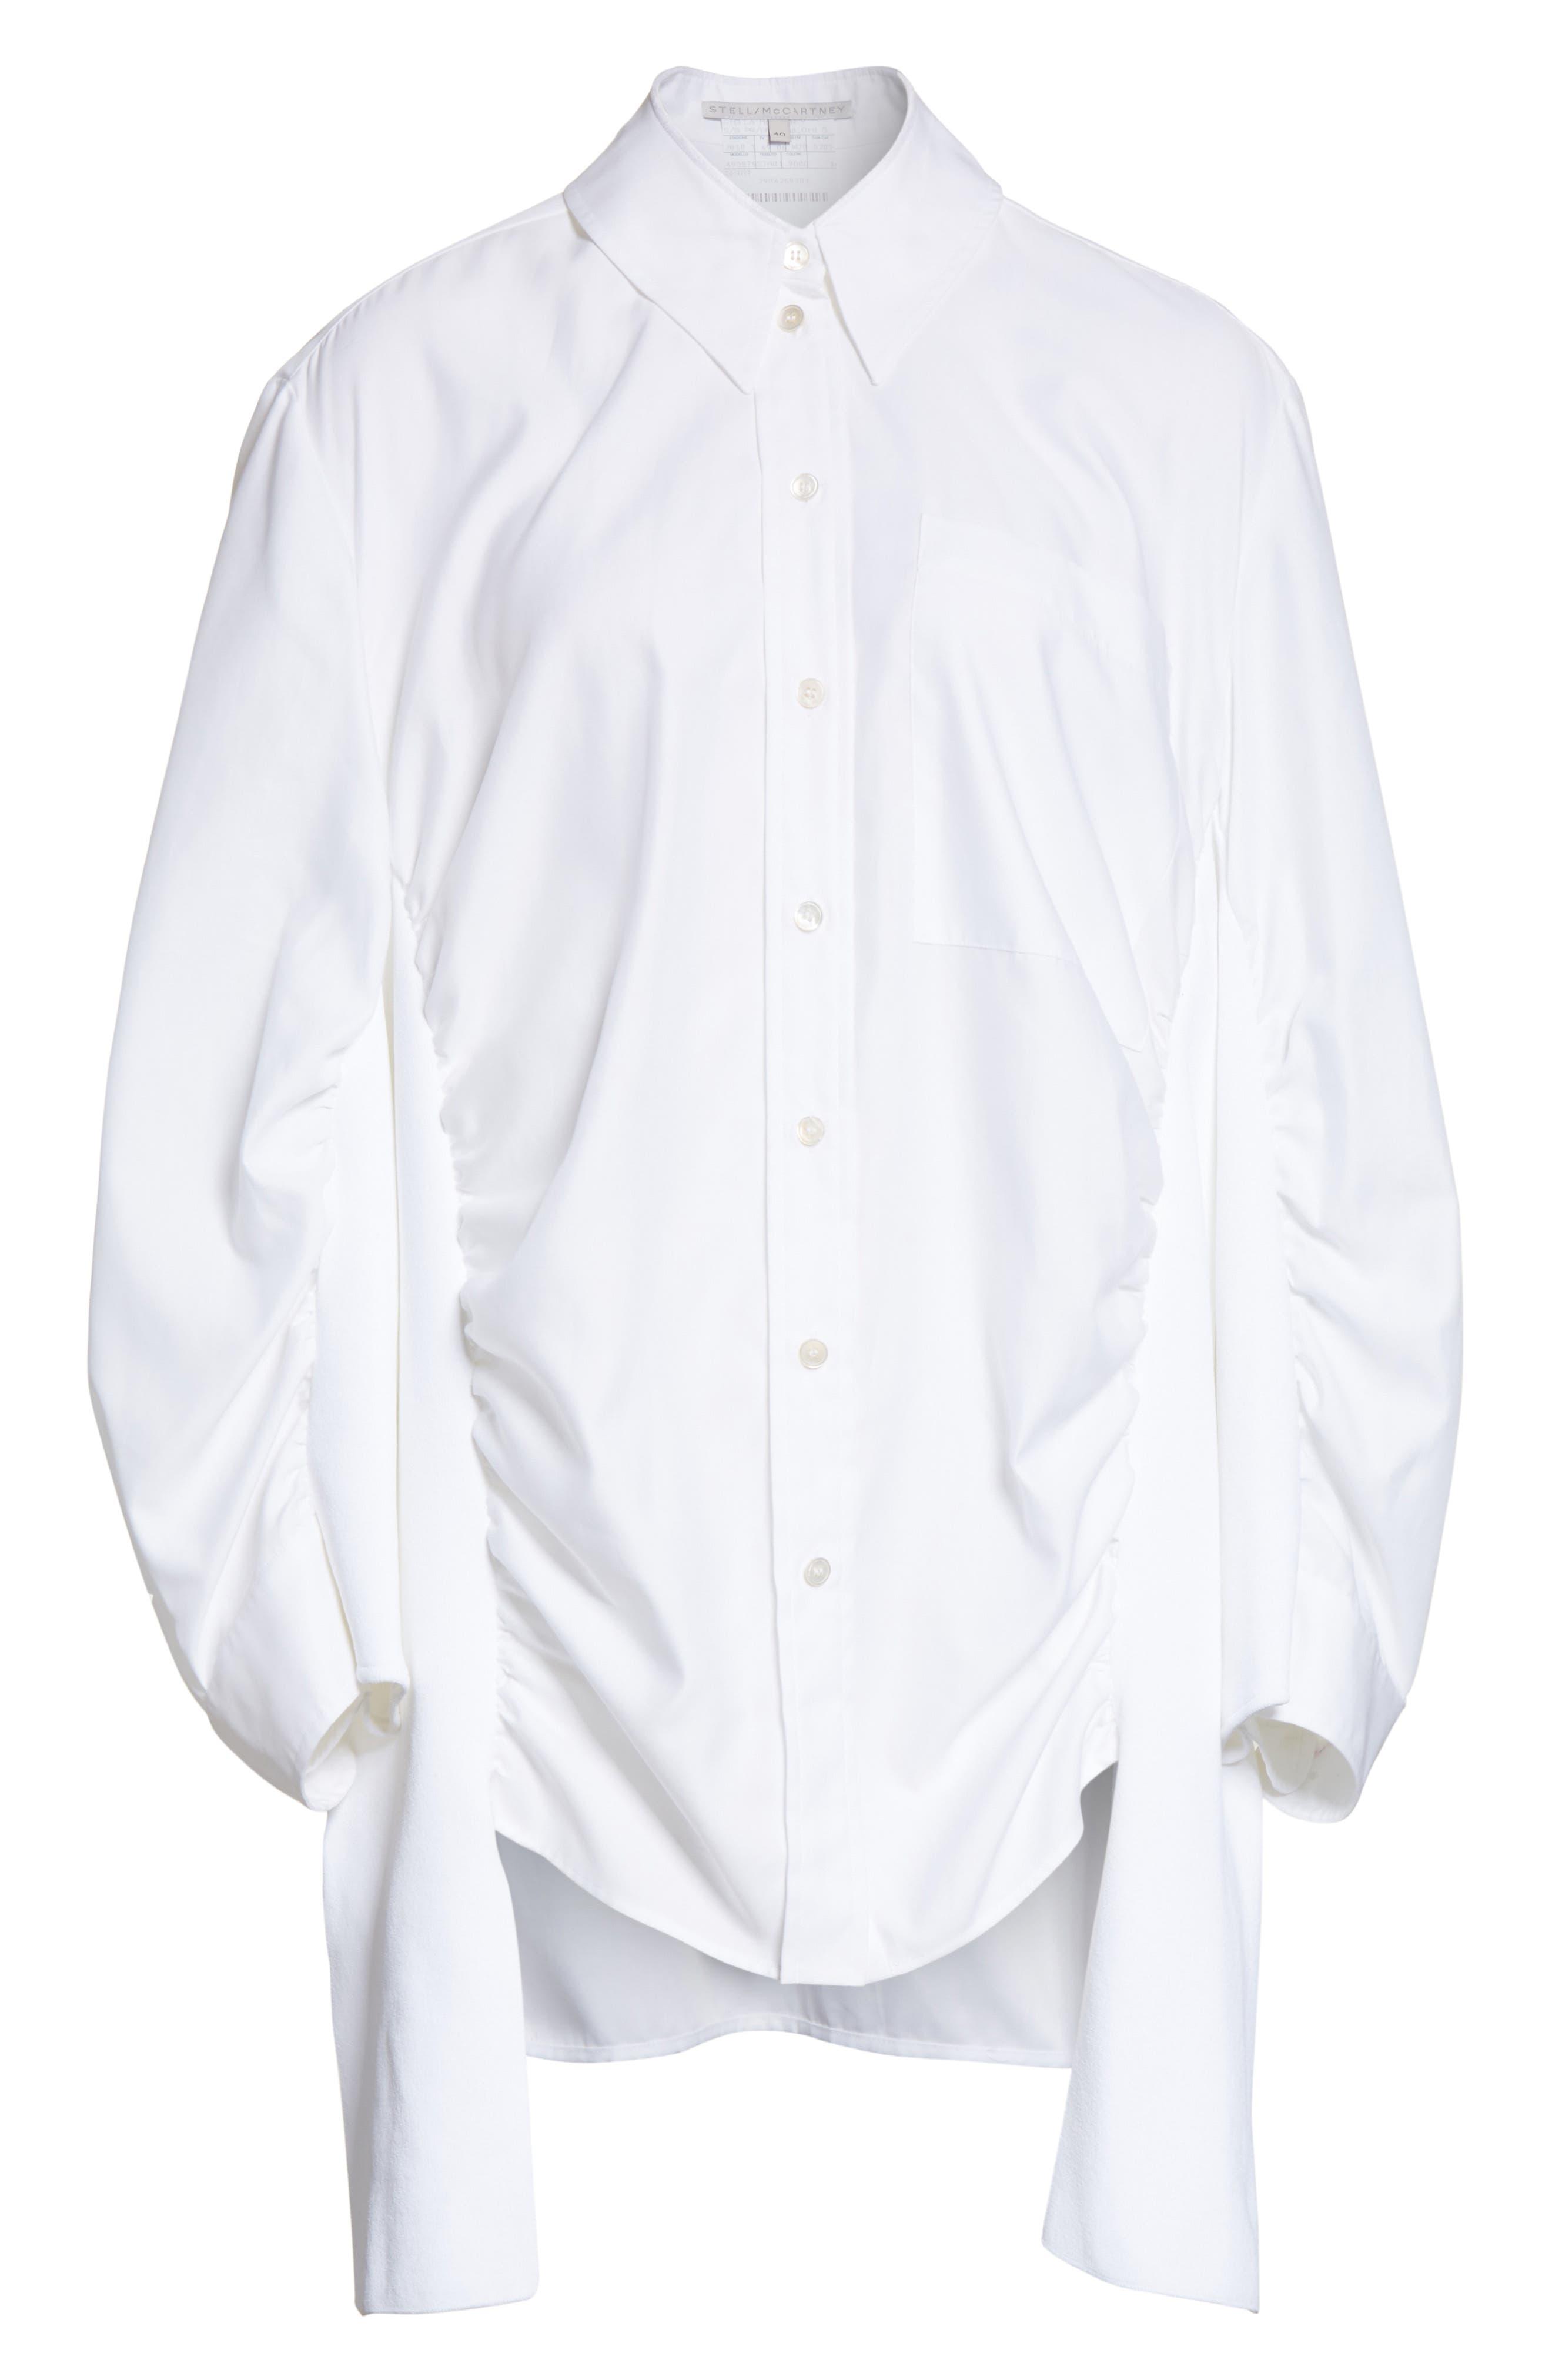 Tape Detail Cotton Shirt,                             Alternate thumbnail 6, color,                             100